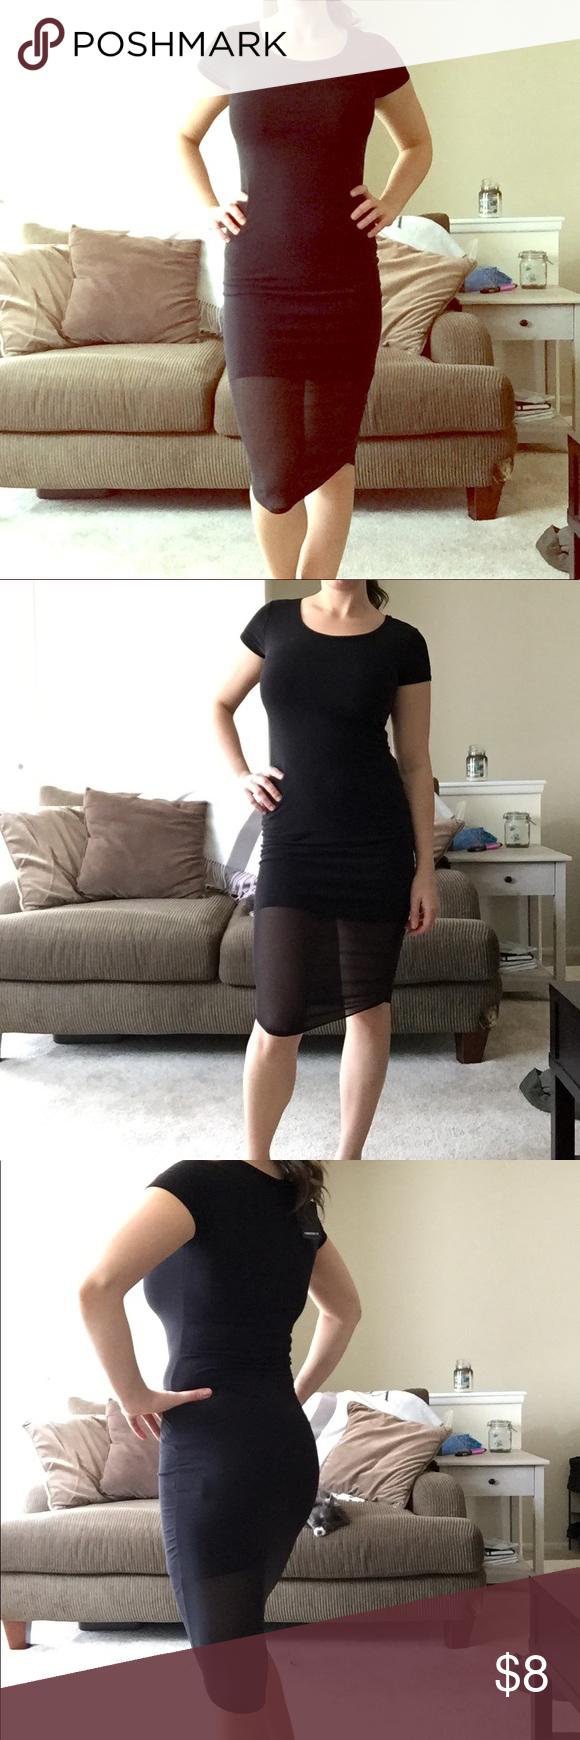 Little black dress nwt sheer dress long black and black dress shorts